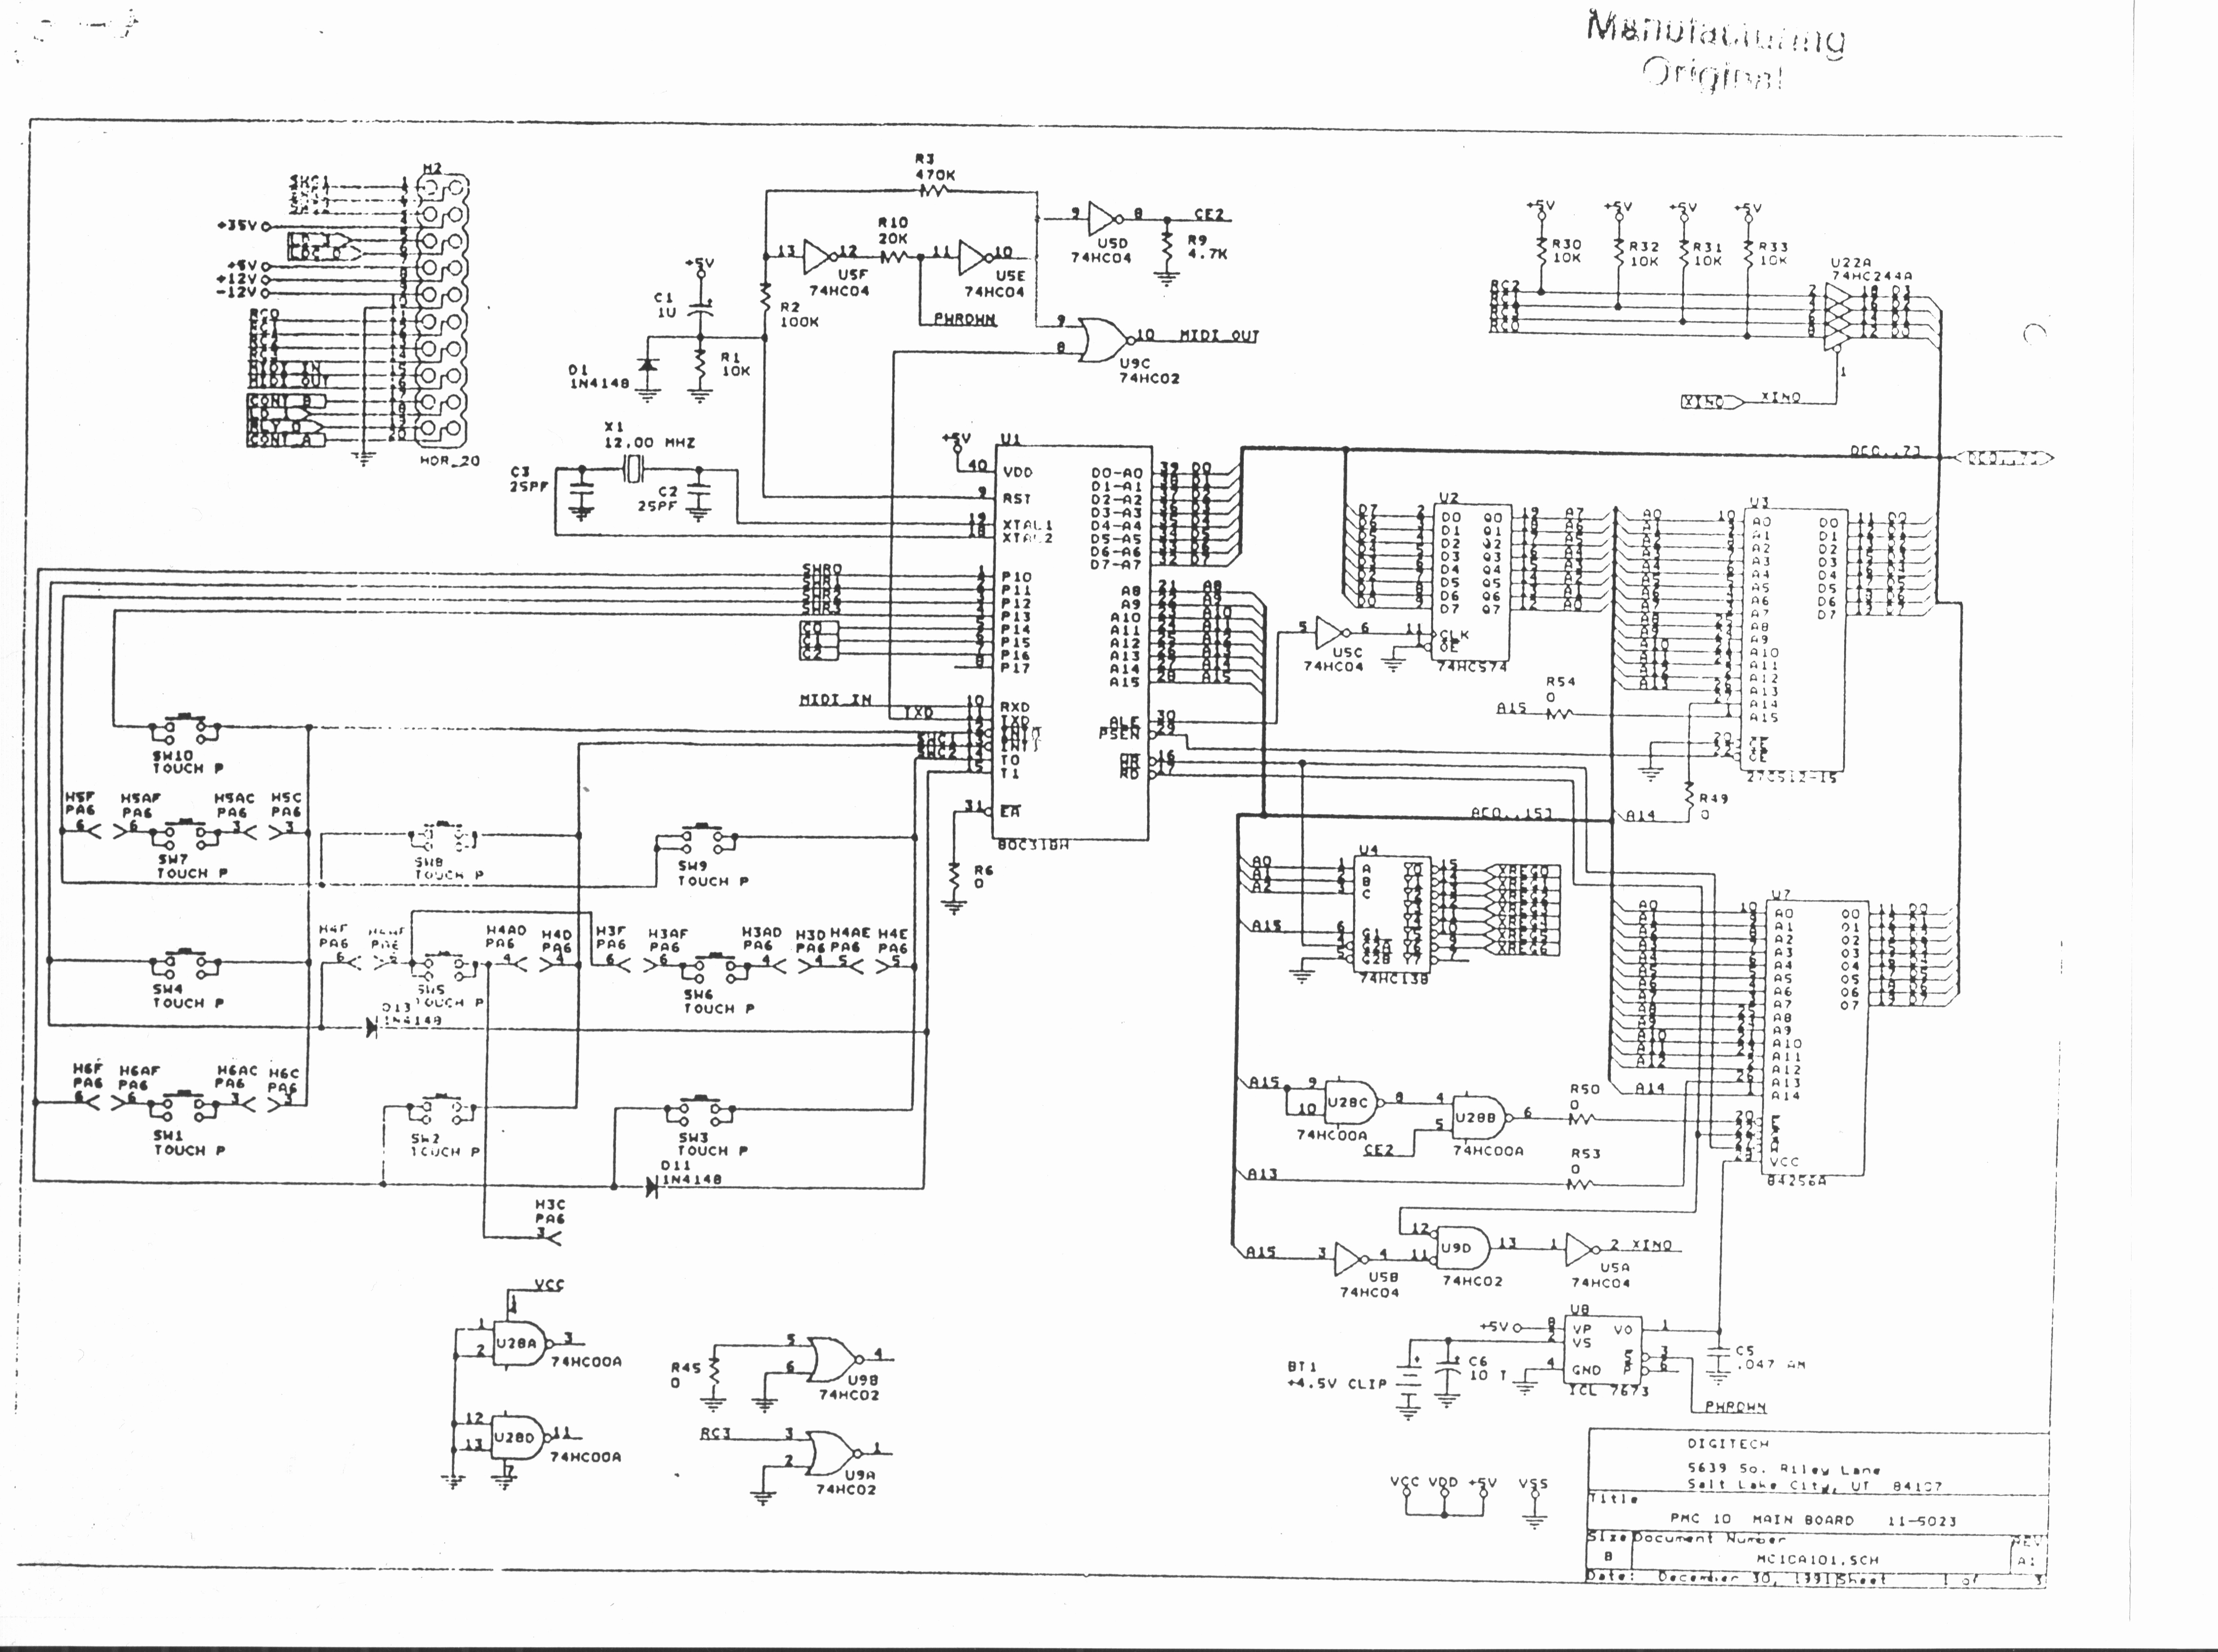 schematic diagram konicaminolta dimage dual scan iv